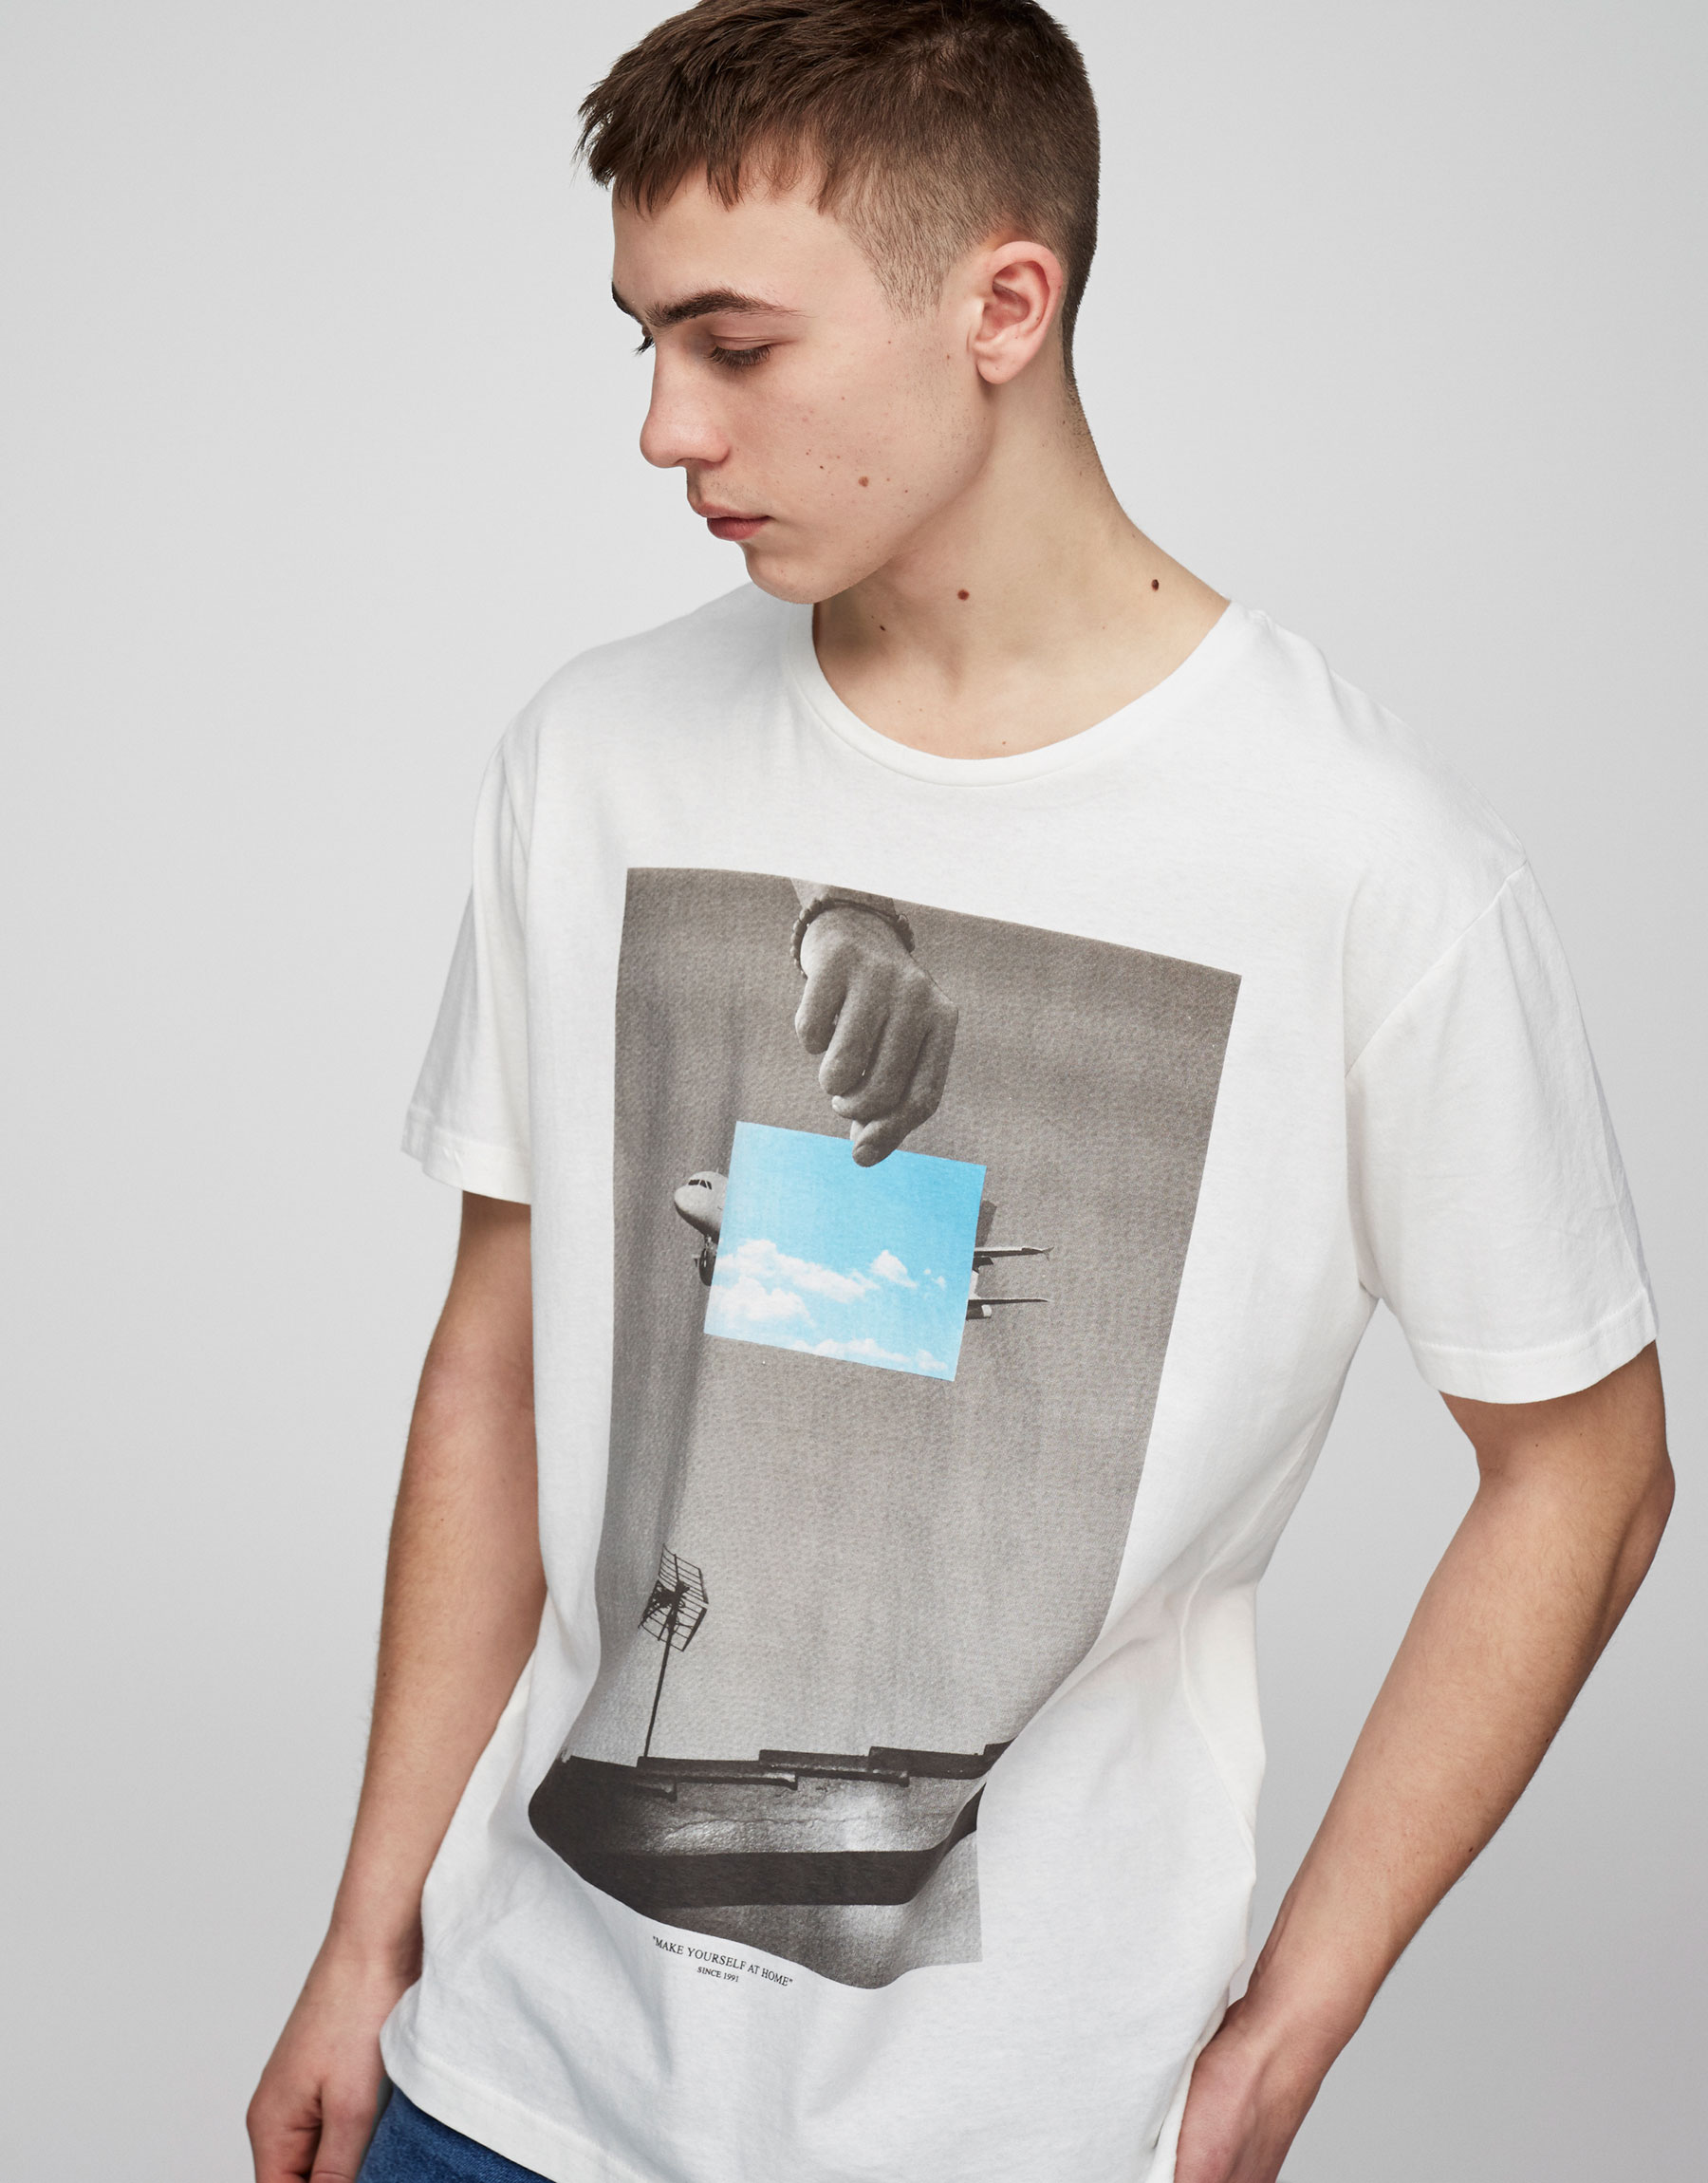 T-Shirt mit Flugzeugprint